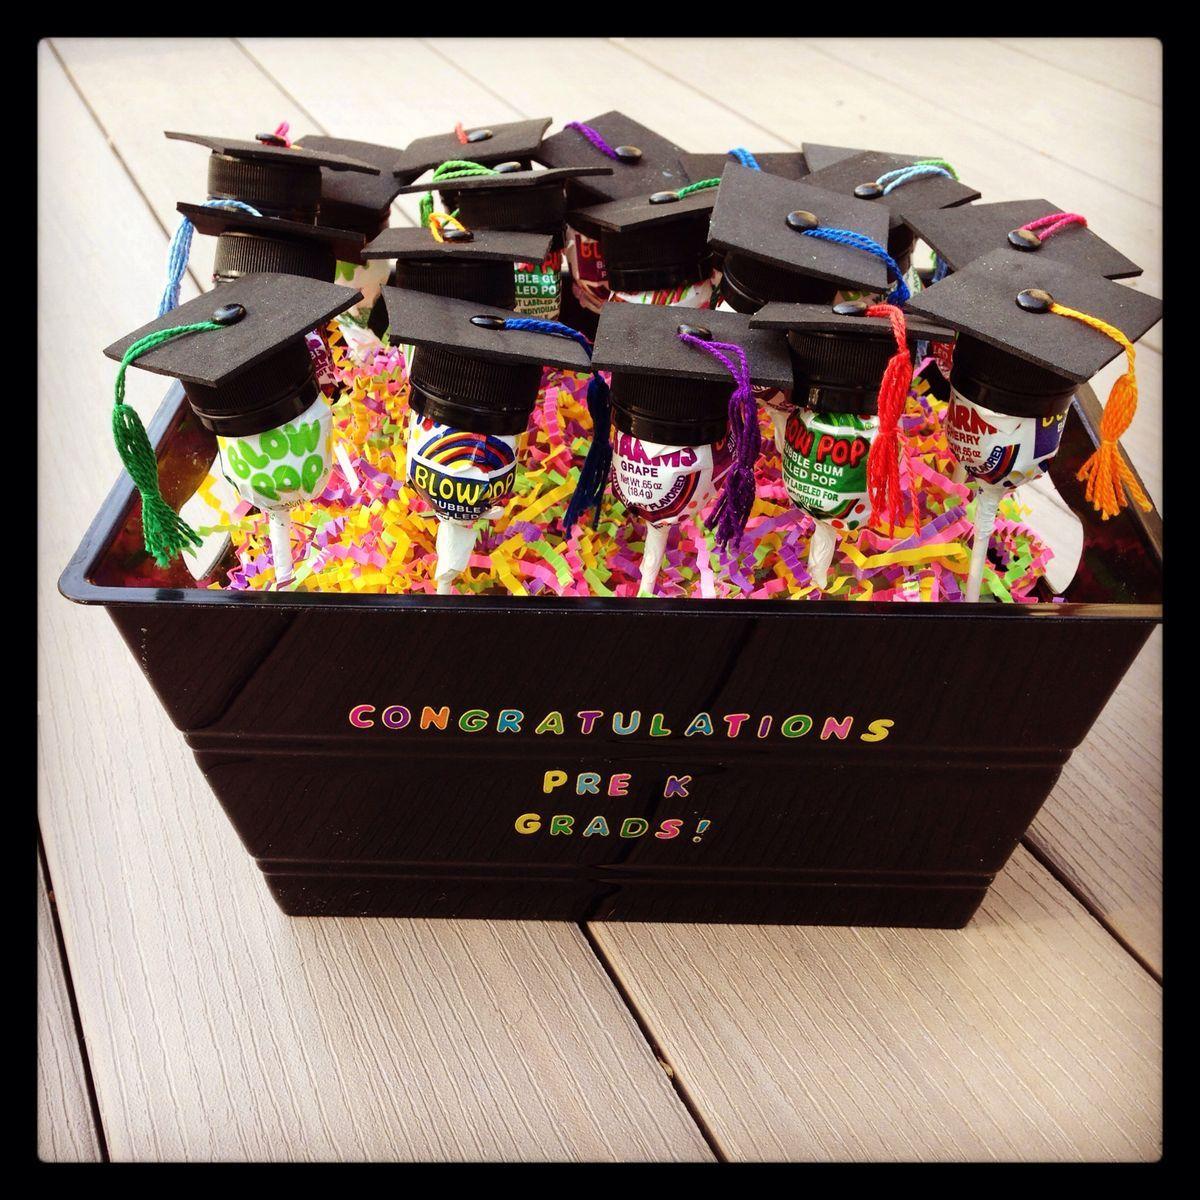 3f60ad64aac50d72847f192bc3044666 - Kindergarten Graduation Gift Ideas